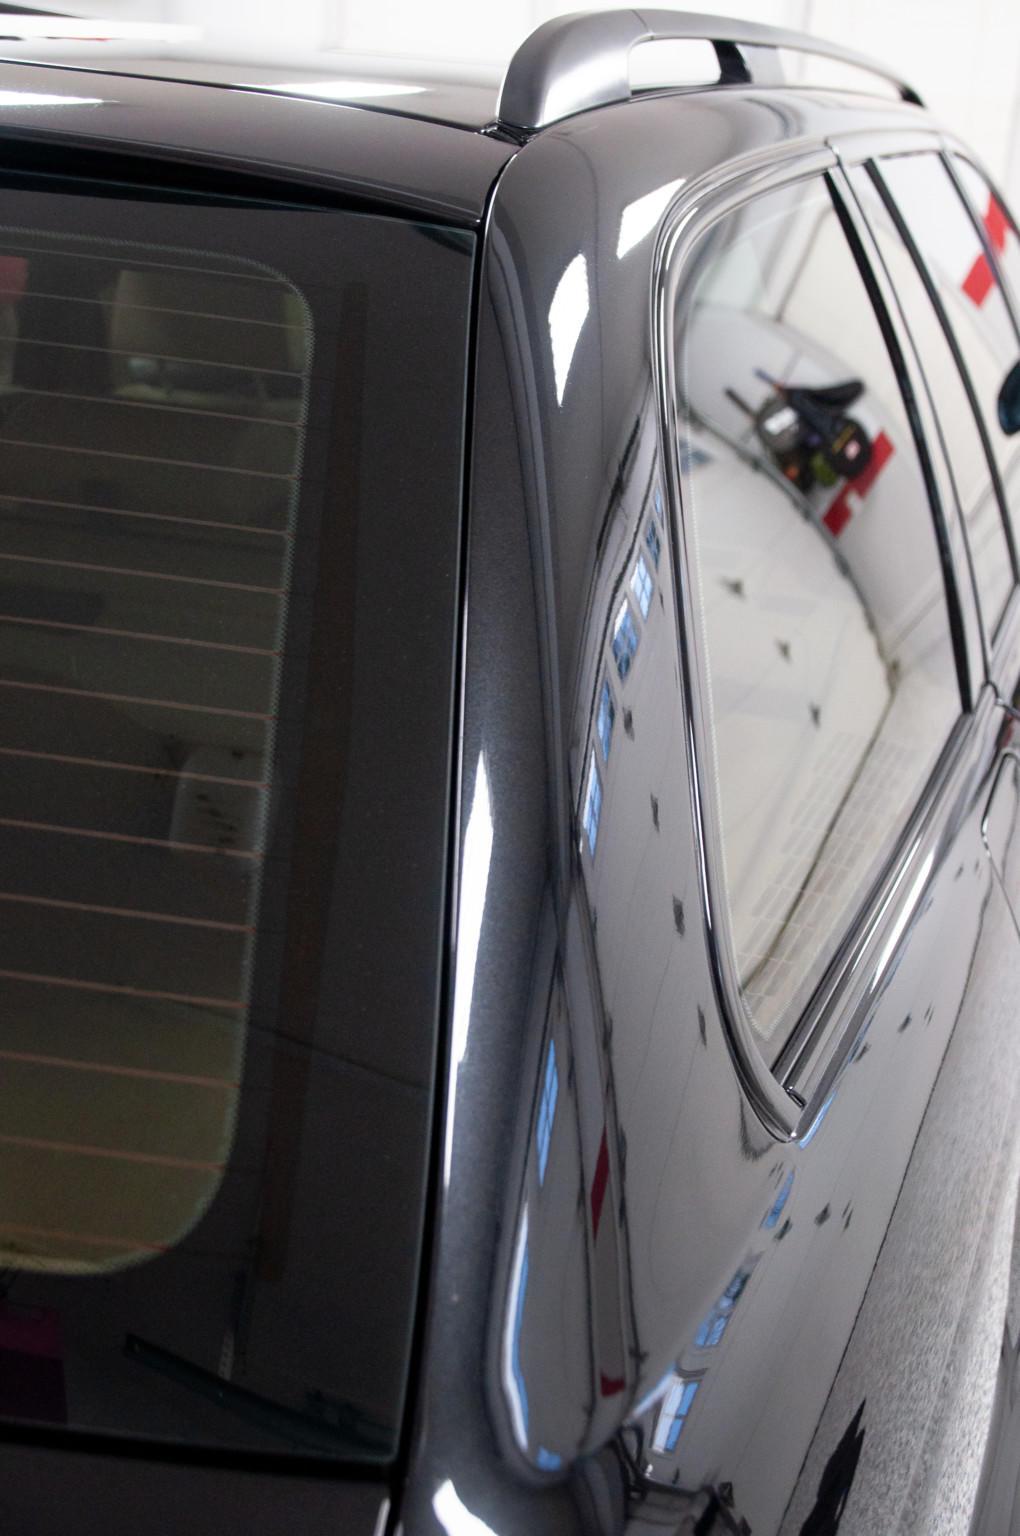 BMW M5 E39 Touring - BMW M5 E39 Touring